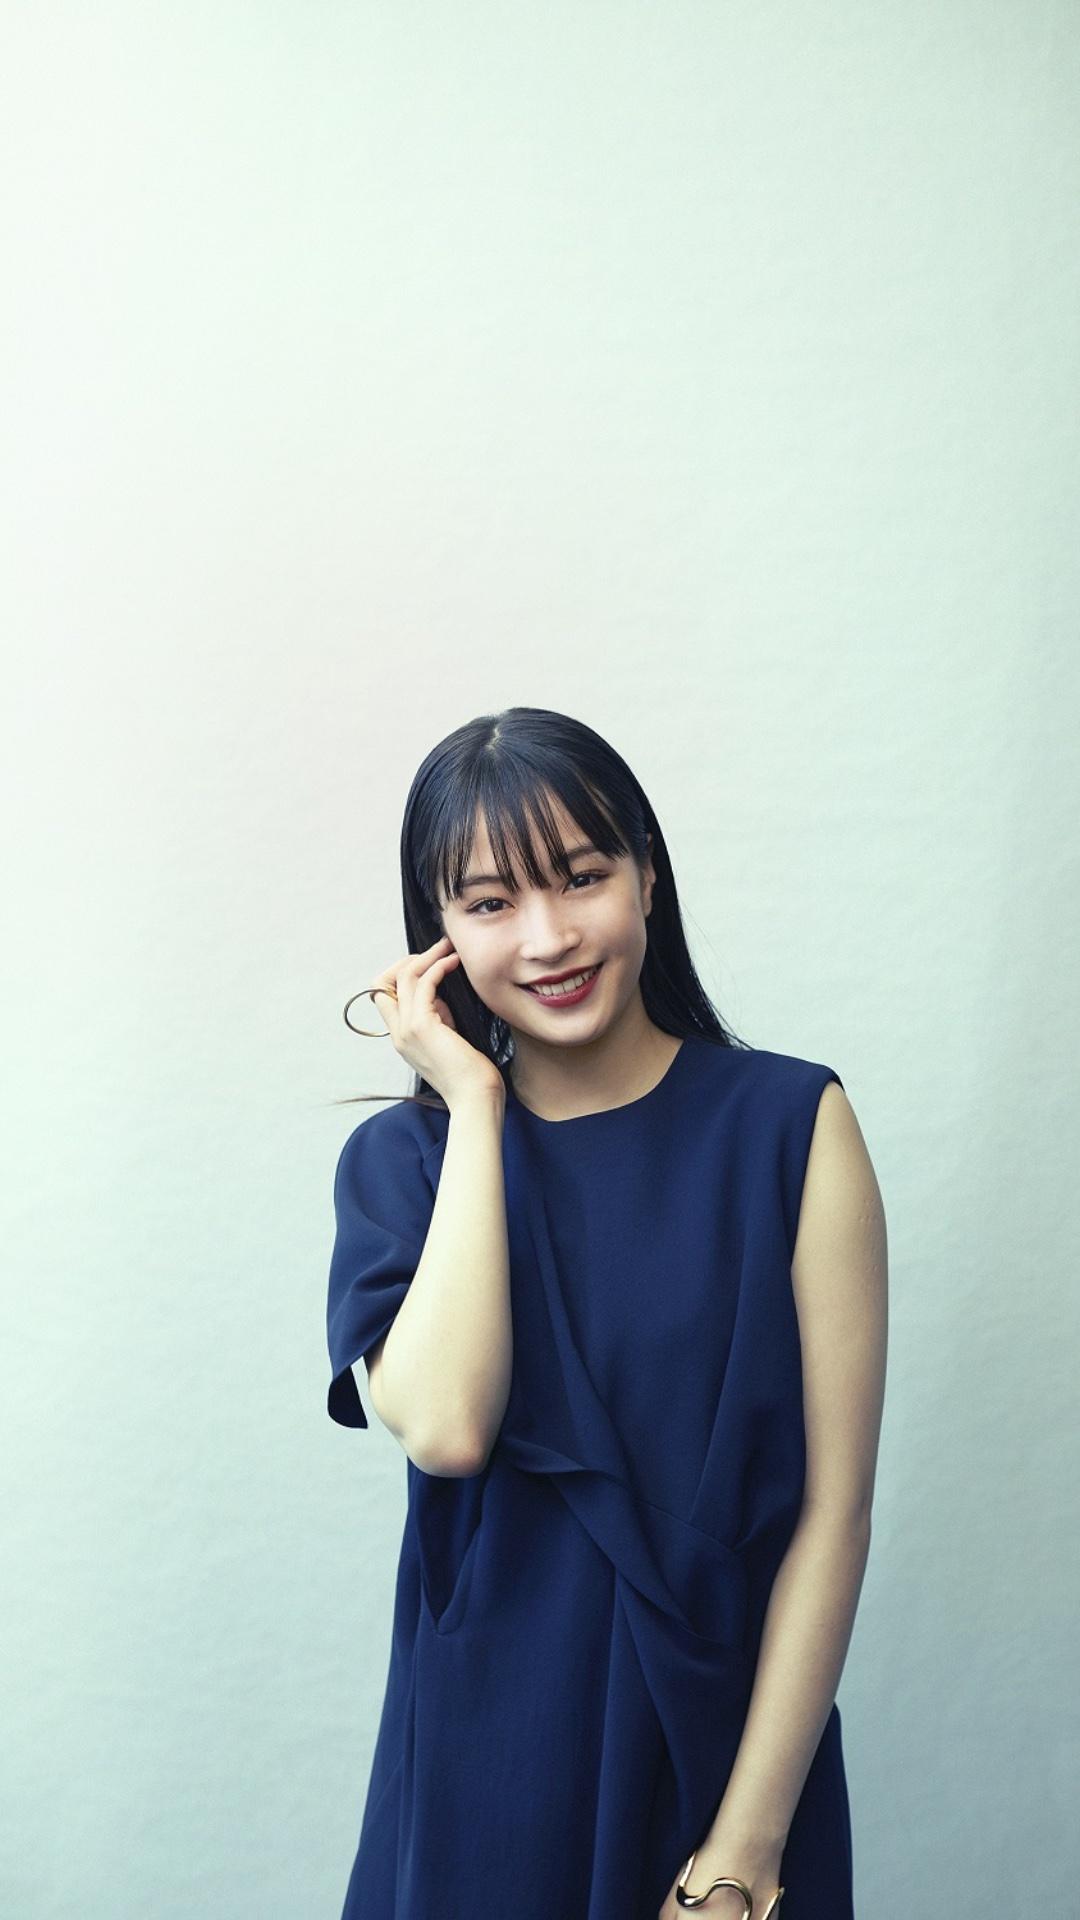 hirosesuzu08 - 広瀬すずのかわいい💓高画質スマホ壁紙39枚 [iPhone&Androidに対応]